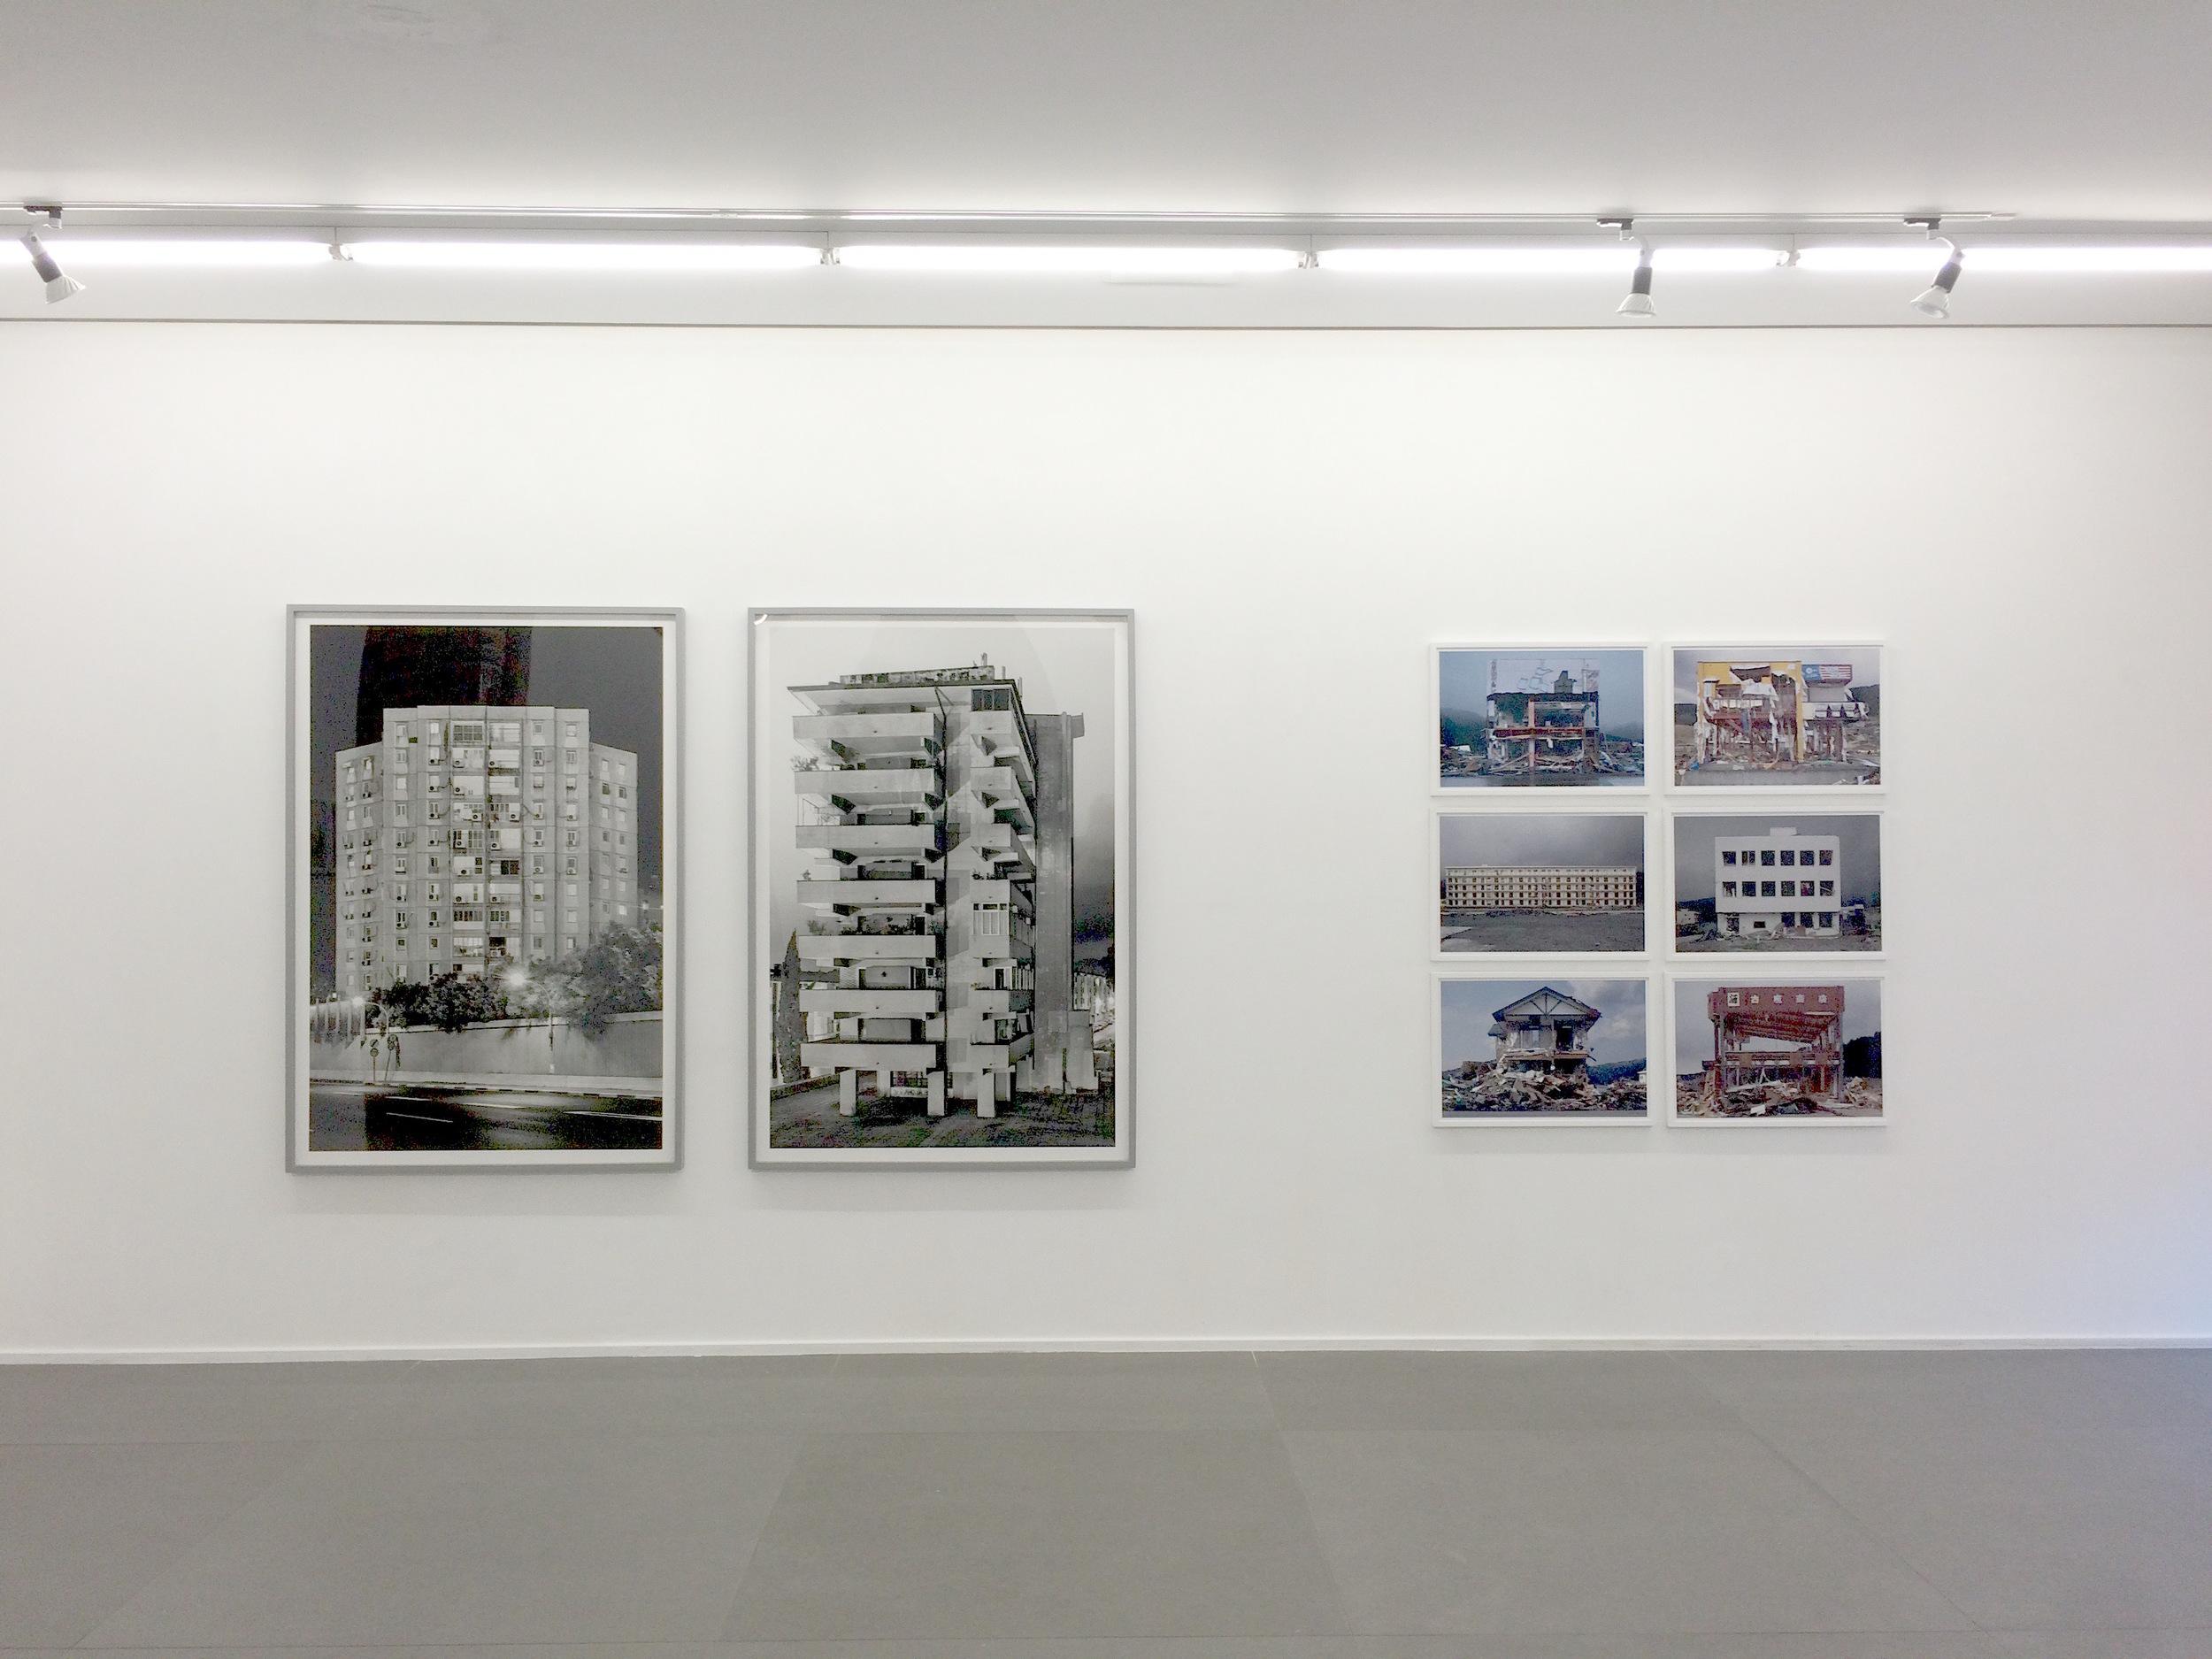 Installation view, works by Eli Singalovski and Hirohito Nomoto